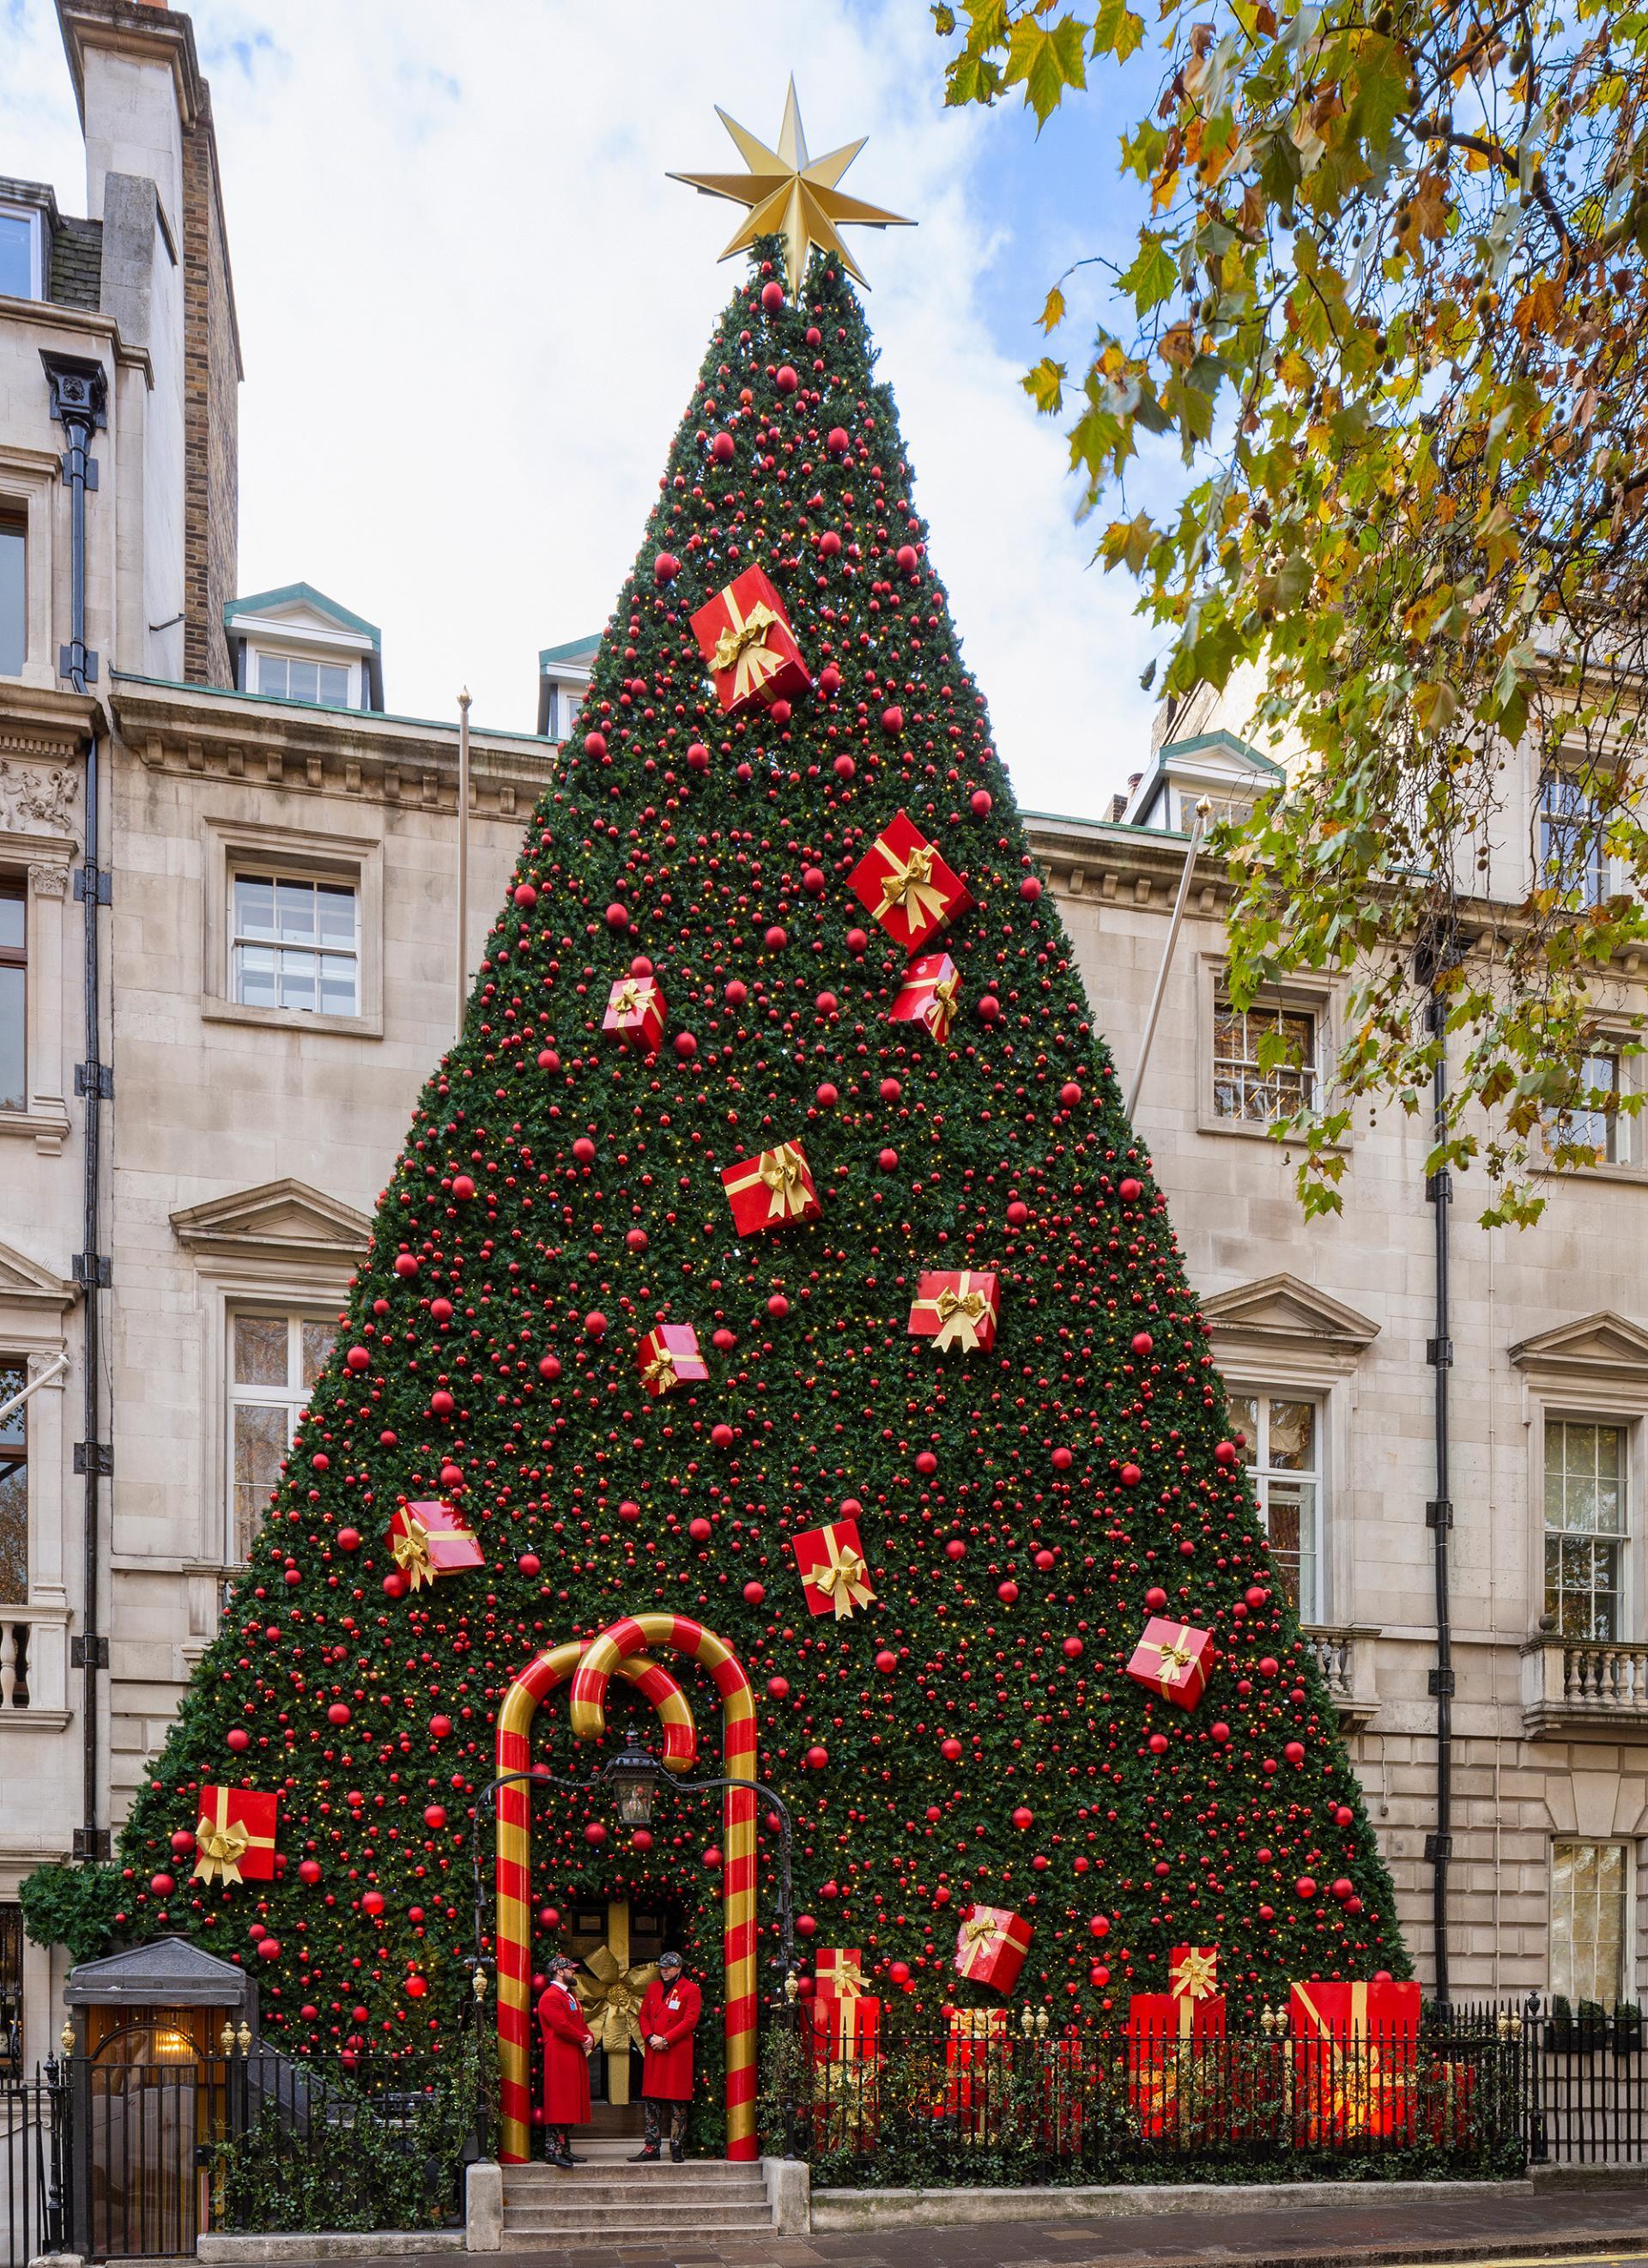 annabels-christmas-tree-london1 (1).jpg